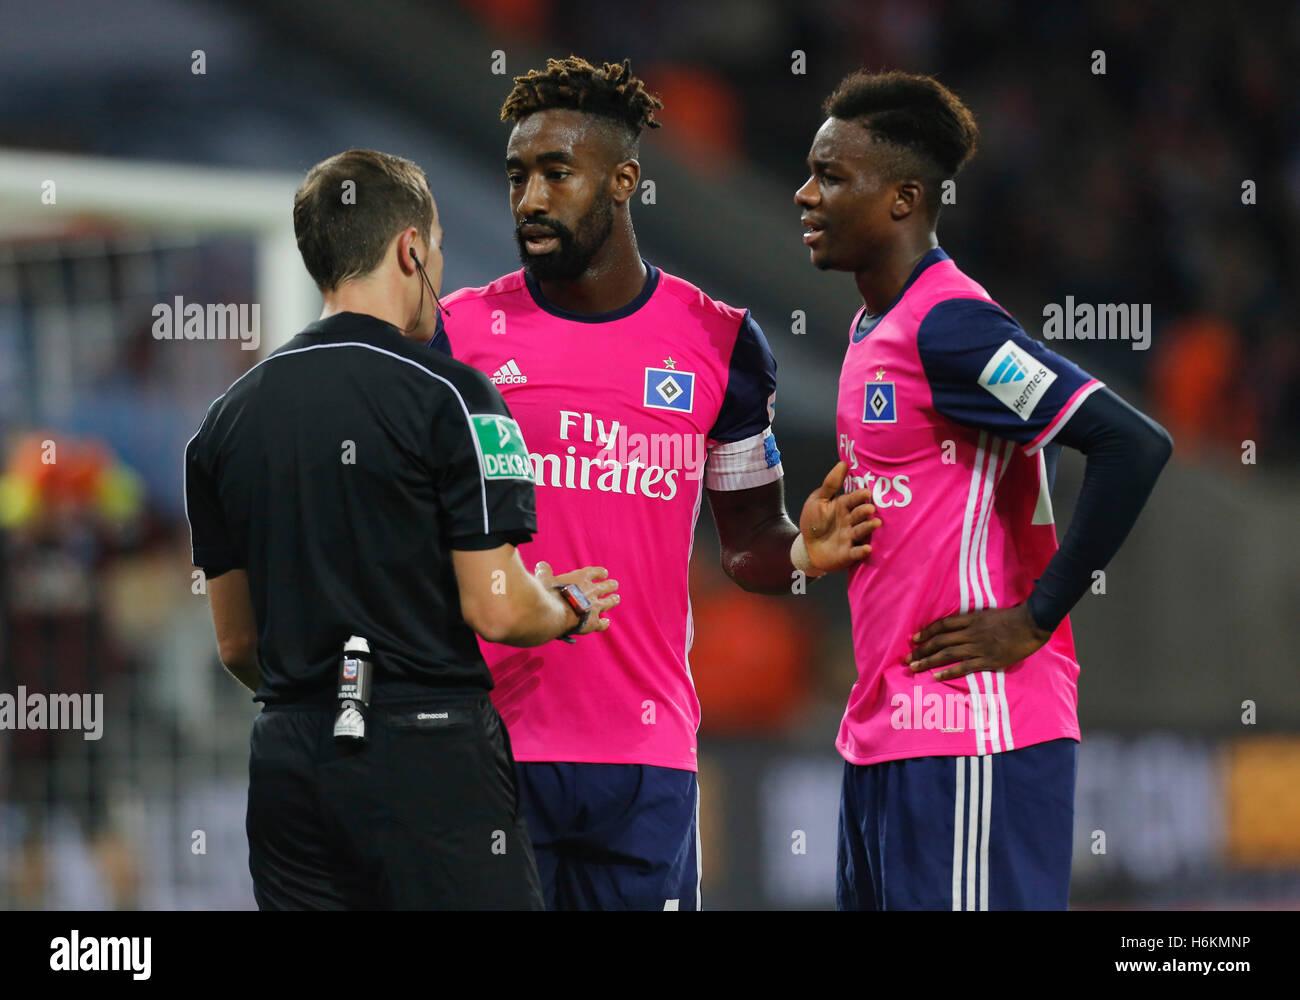 Cologne, Germany 30.10.2016, Bundesliga matchday 9, 1. FC Koeln - Hamburger SV:  Referee Benjamin Brand  with Johan - Stock Image